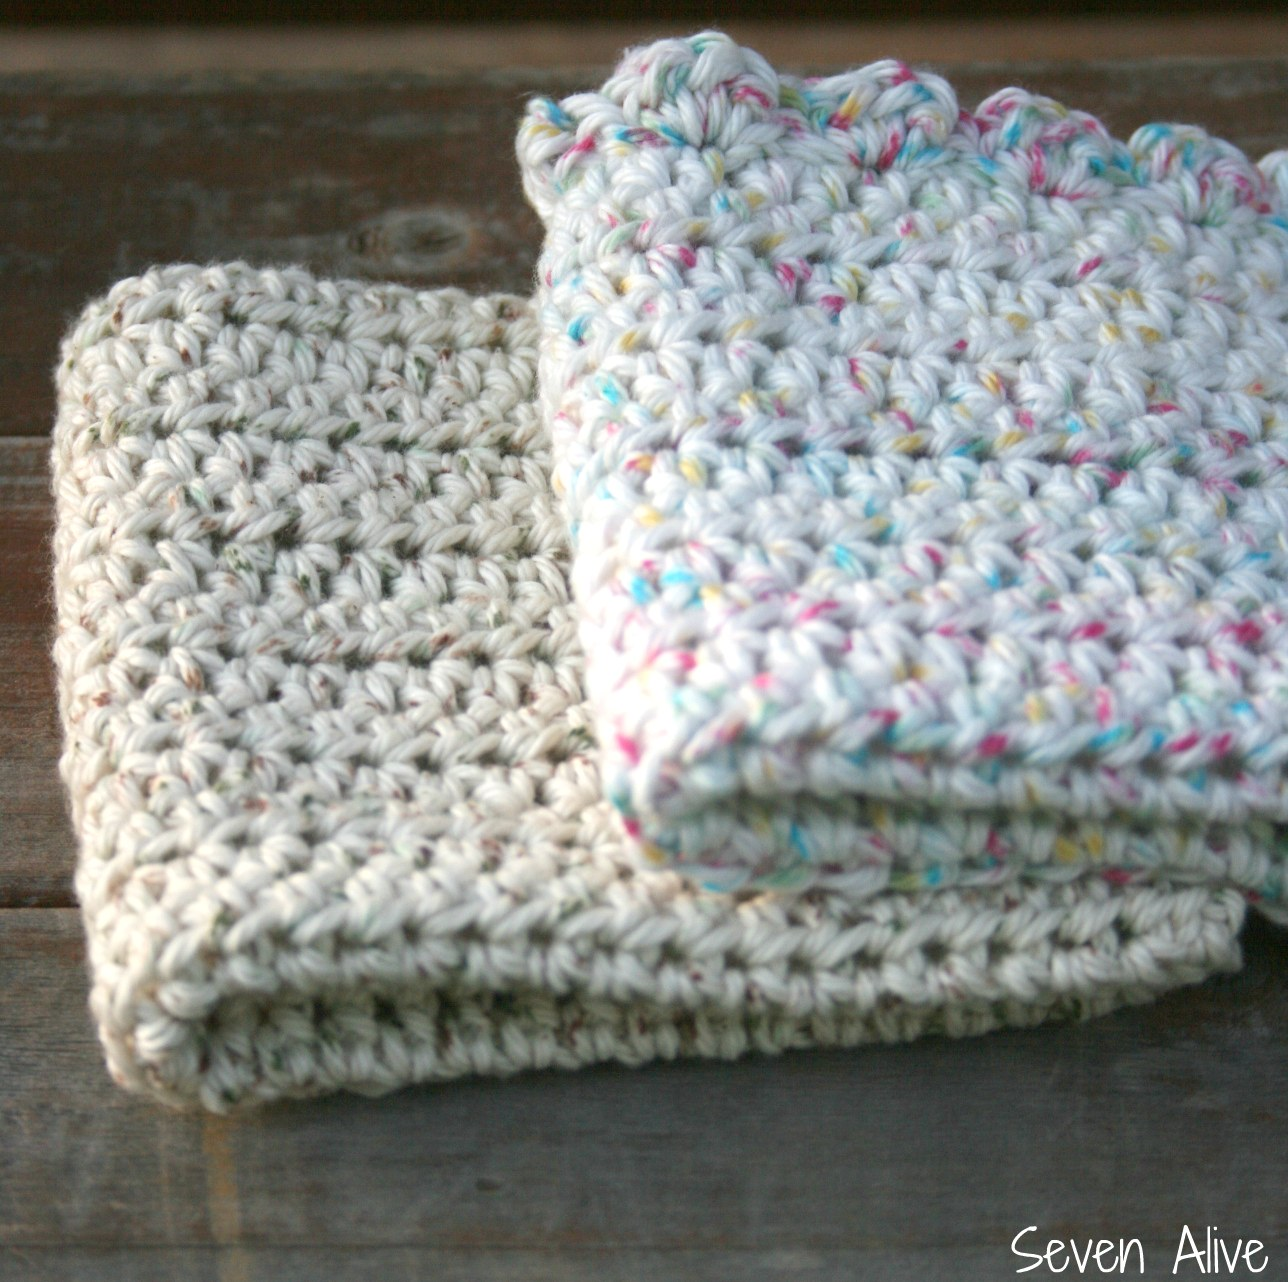 Crochet 101 photo tutorial crocheted dishcloth pattern seven alive bankloansurffo Gallery